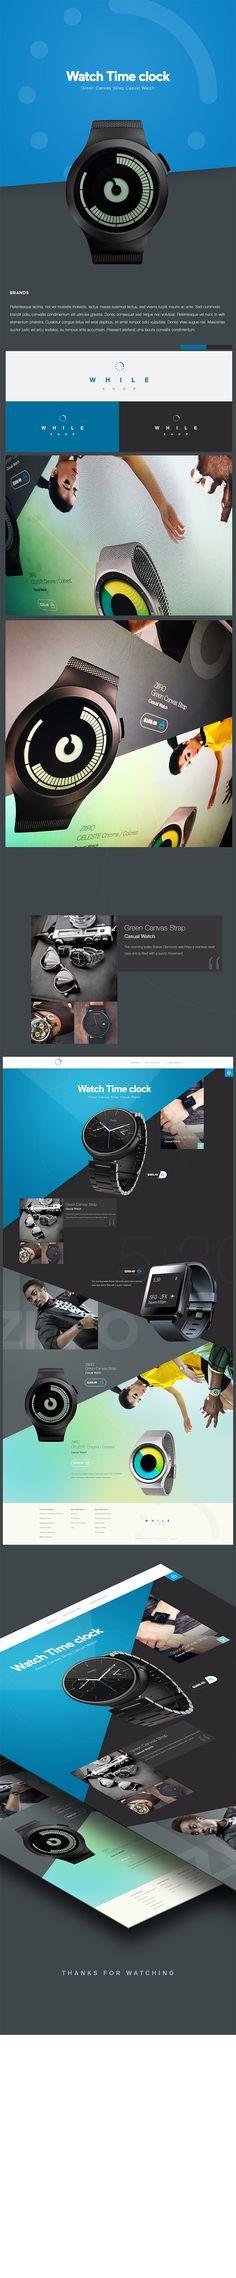 While Shop: interaction store web design (UI/UX Concept) by Cüneyt Şen on Behance.